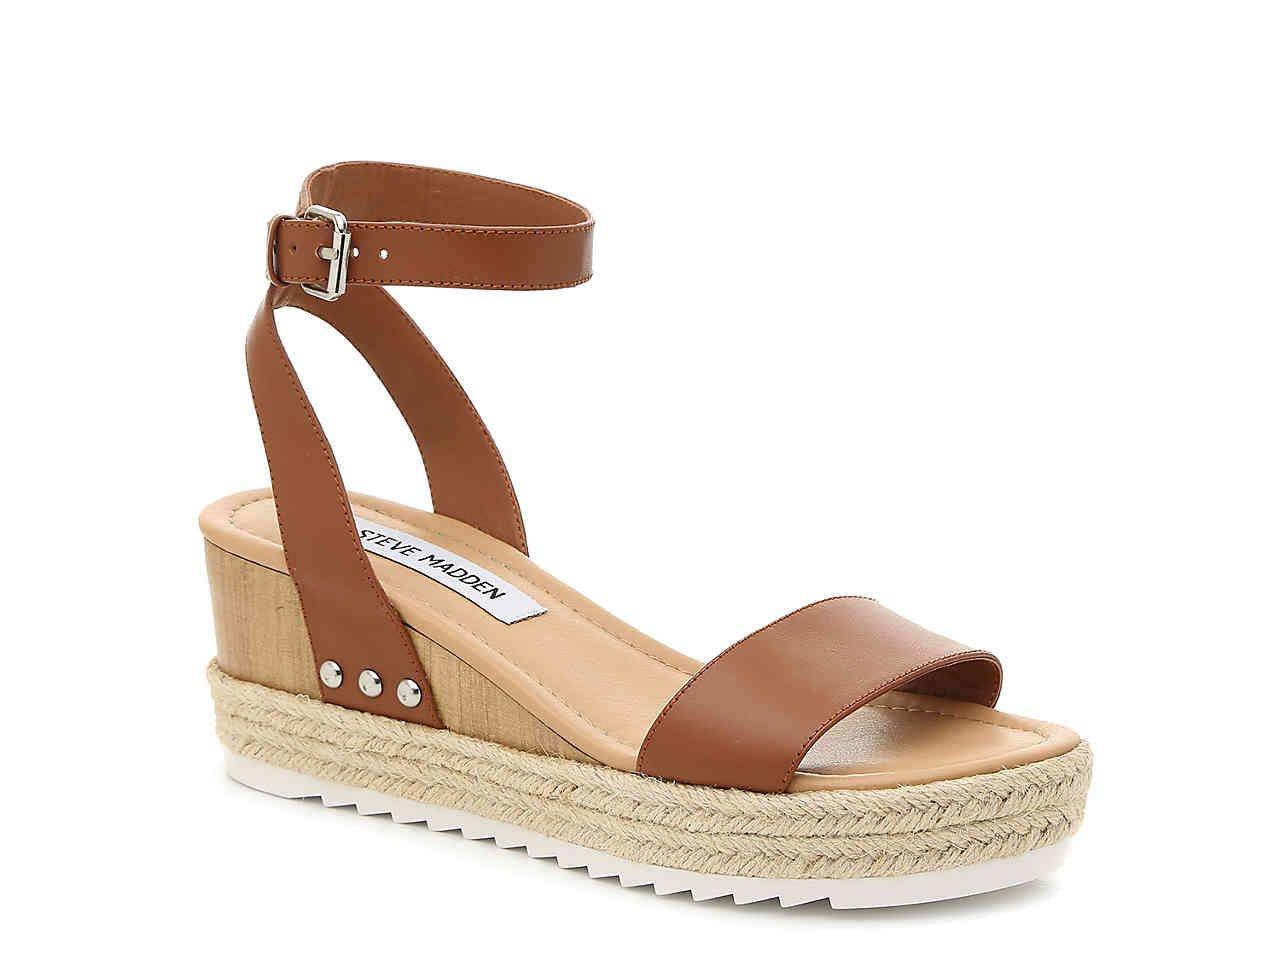 Steve Madden Jewel Espadrille Wedge Sandal Women's Shoes   DSW